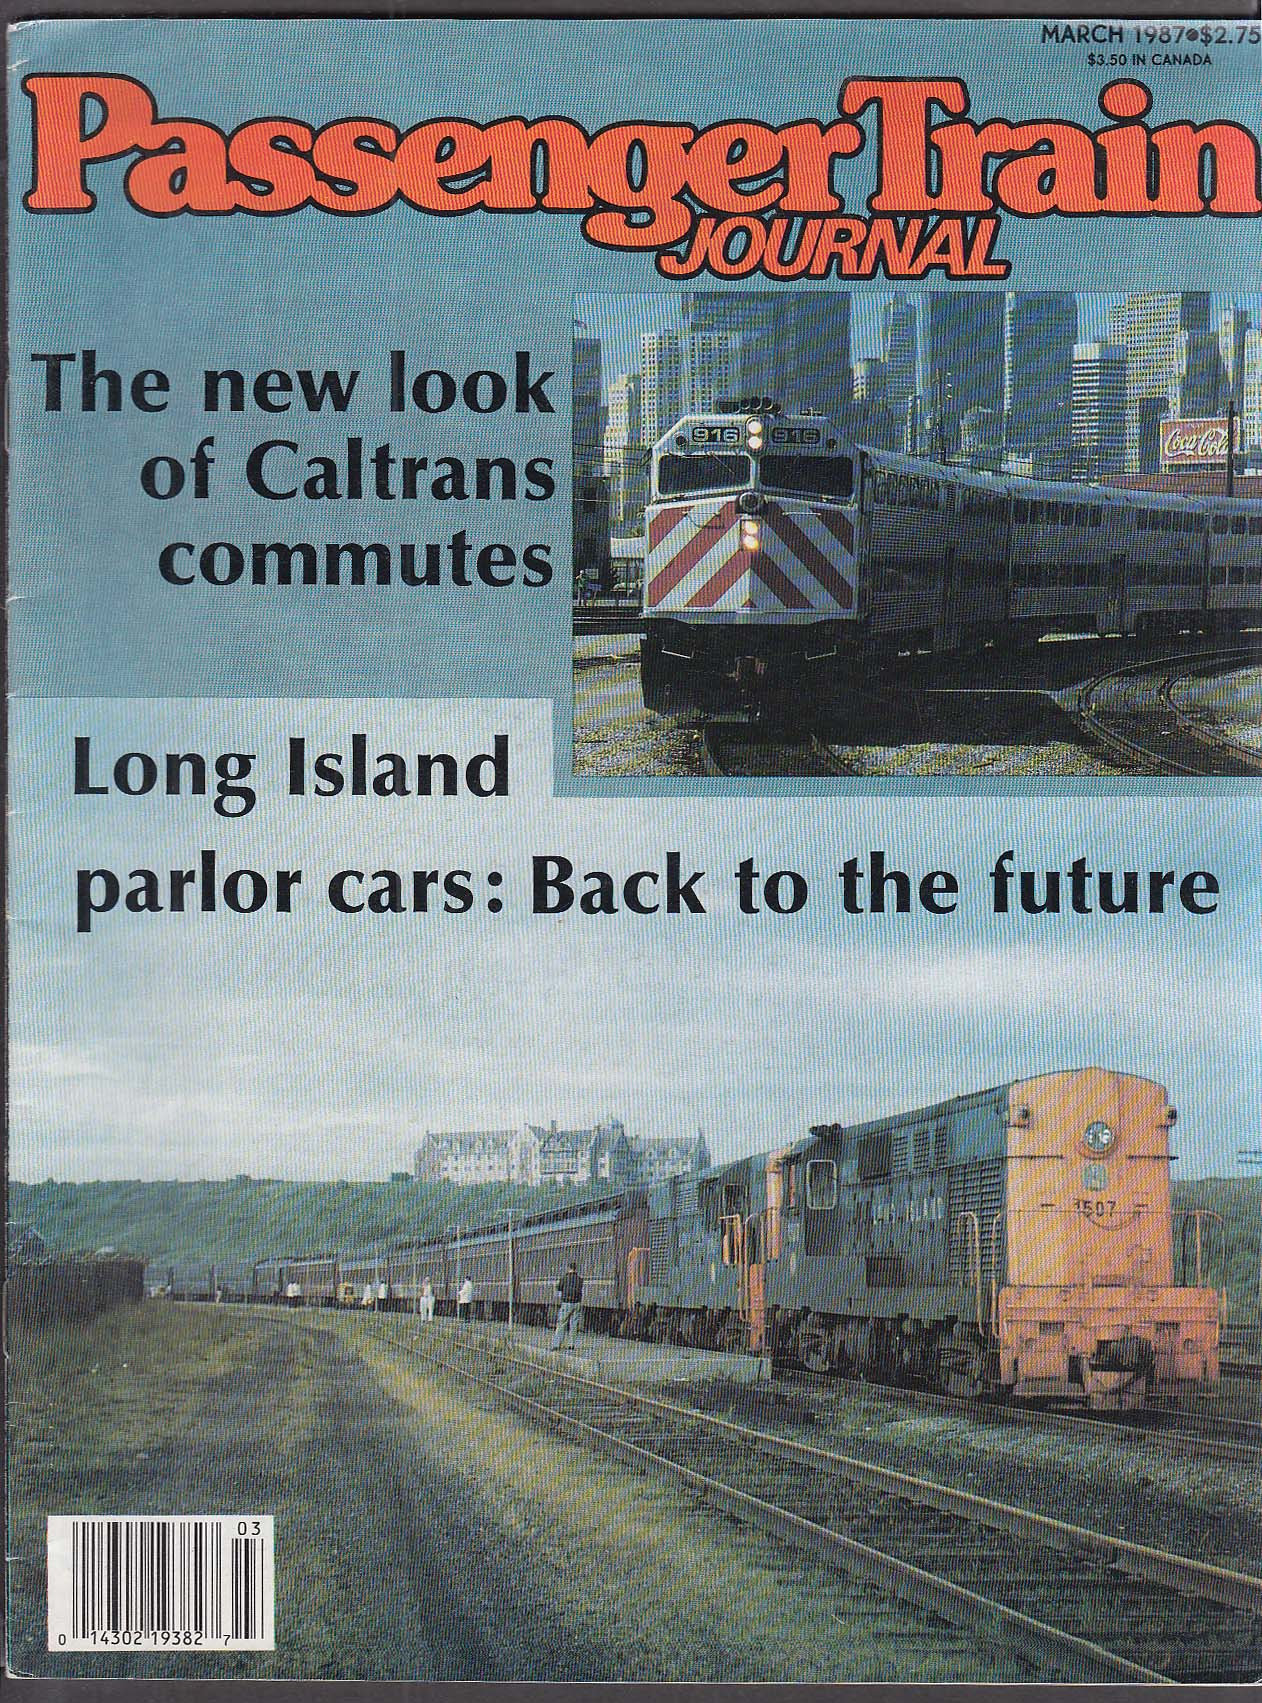 PASSENGER TRAIN JOURNAL Caltrans commuter trains, Long Island parlor cars 3 1987